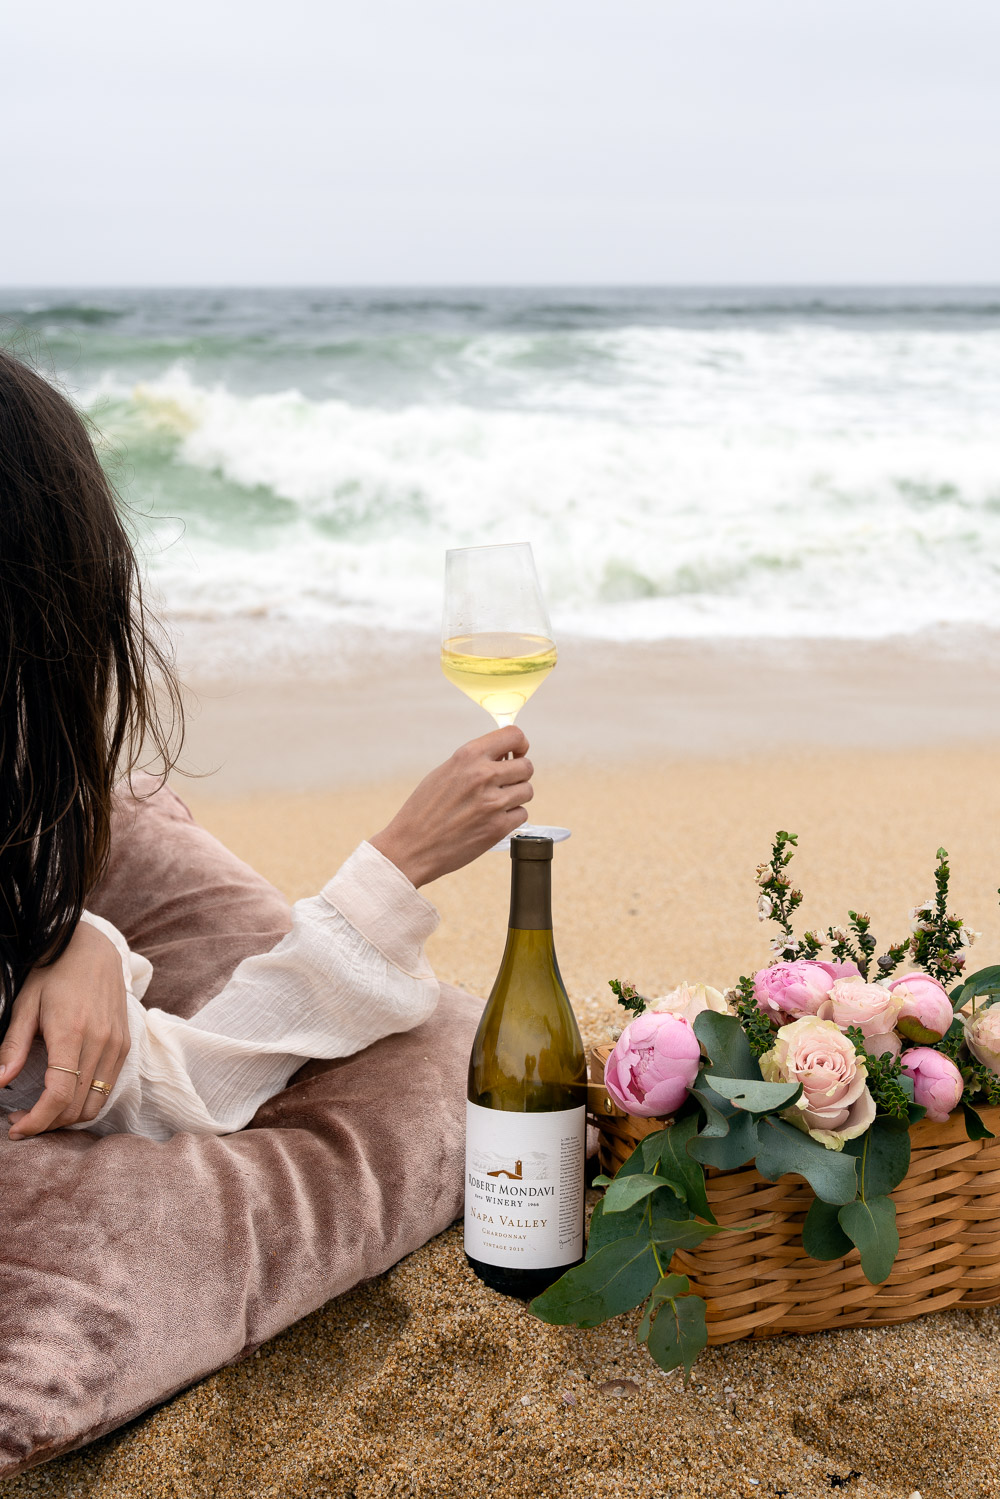 robert-mondavi-beach-picnic-7.jpg